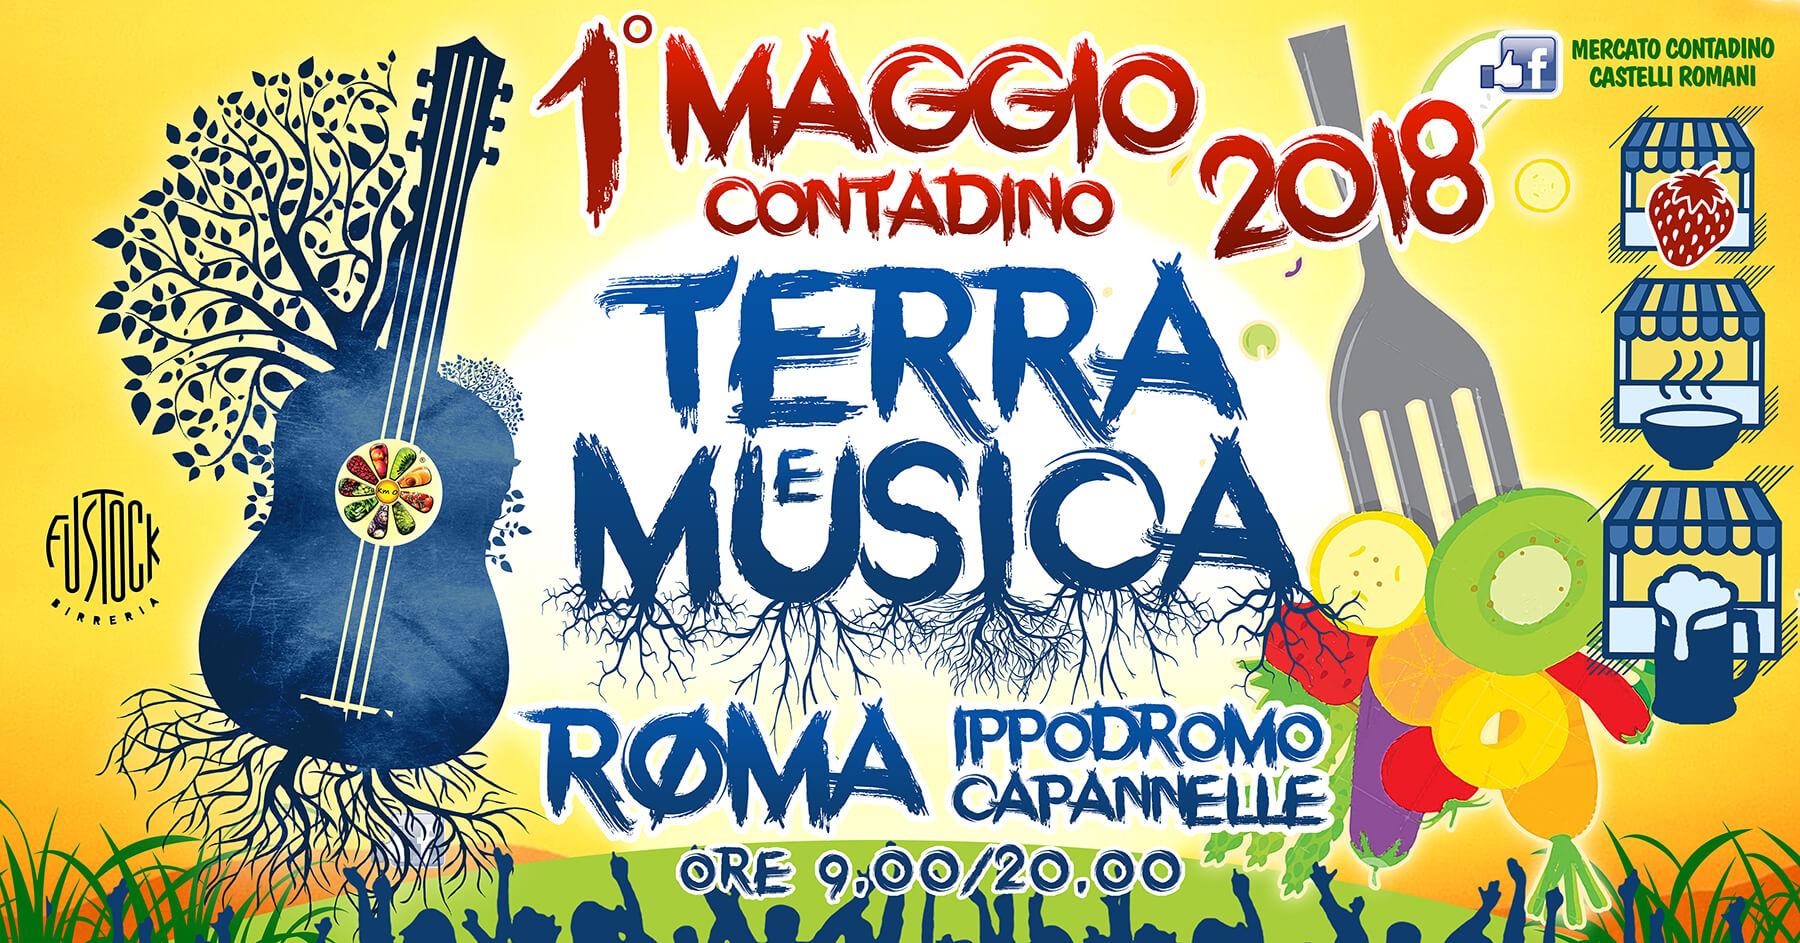 terra_musica_2018_mercato_contadino